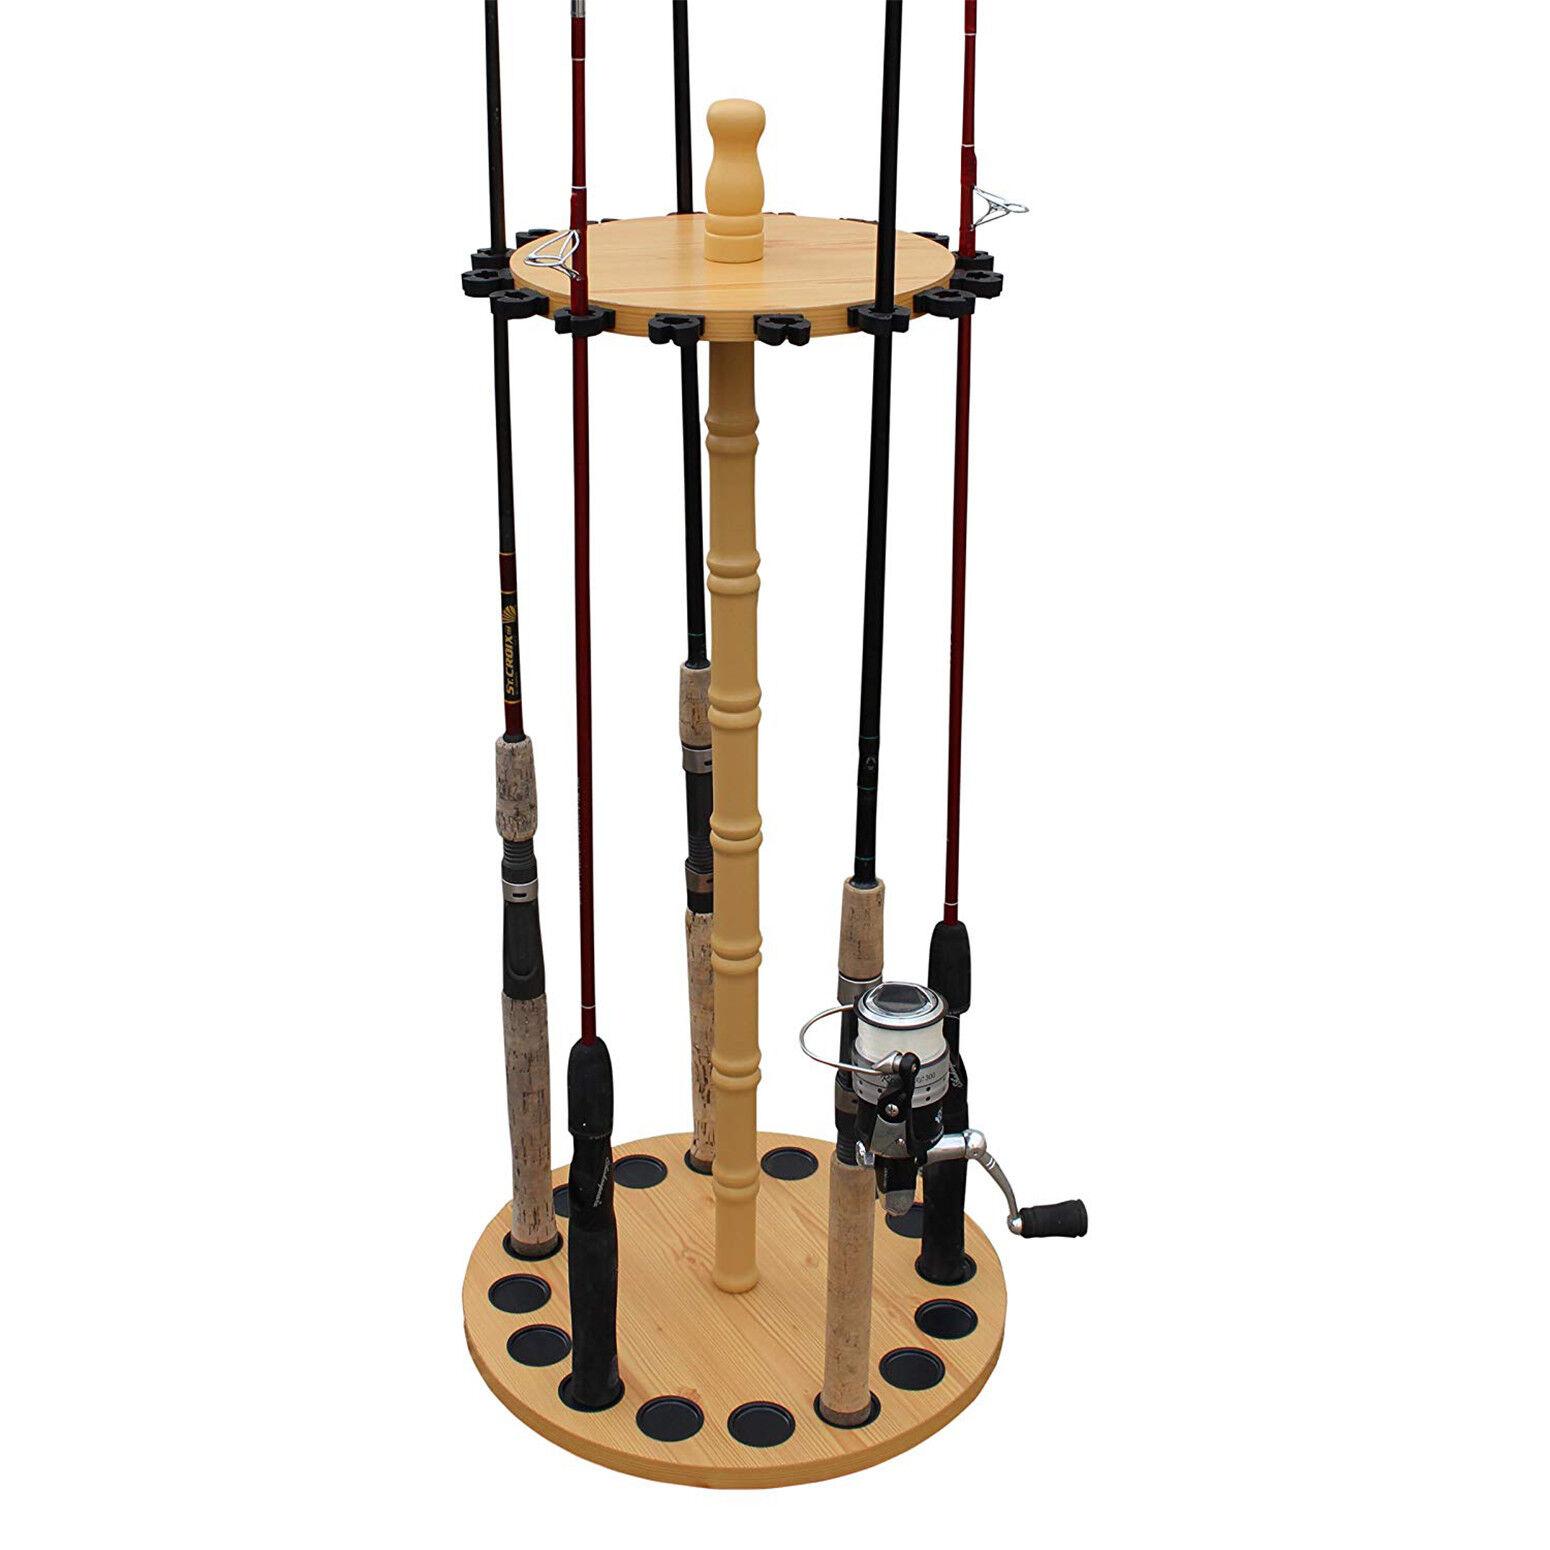 Fishing Rod Holder Portable 16 Rods Storage Organizer Rack Wood Hanger Equipment For Sale Online